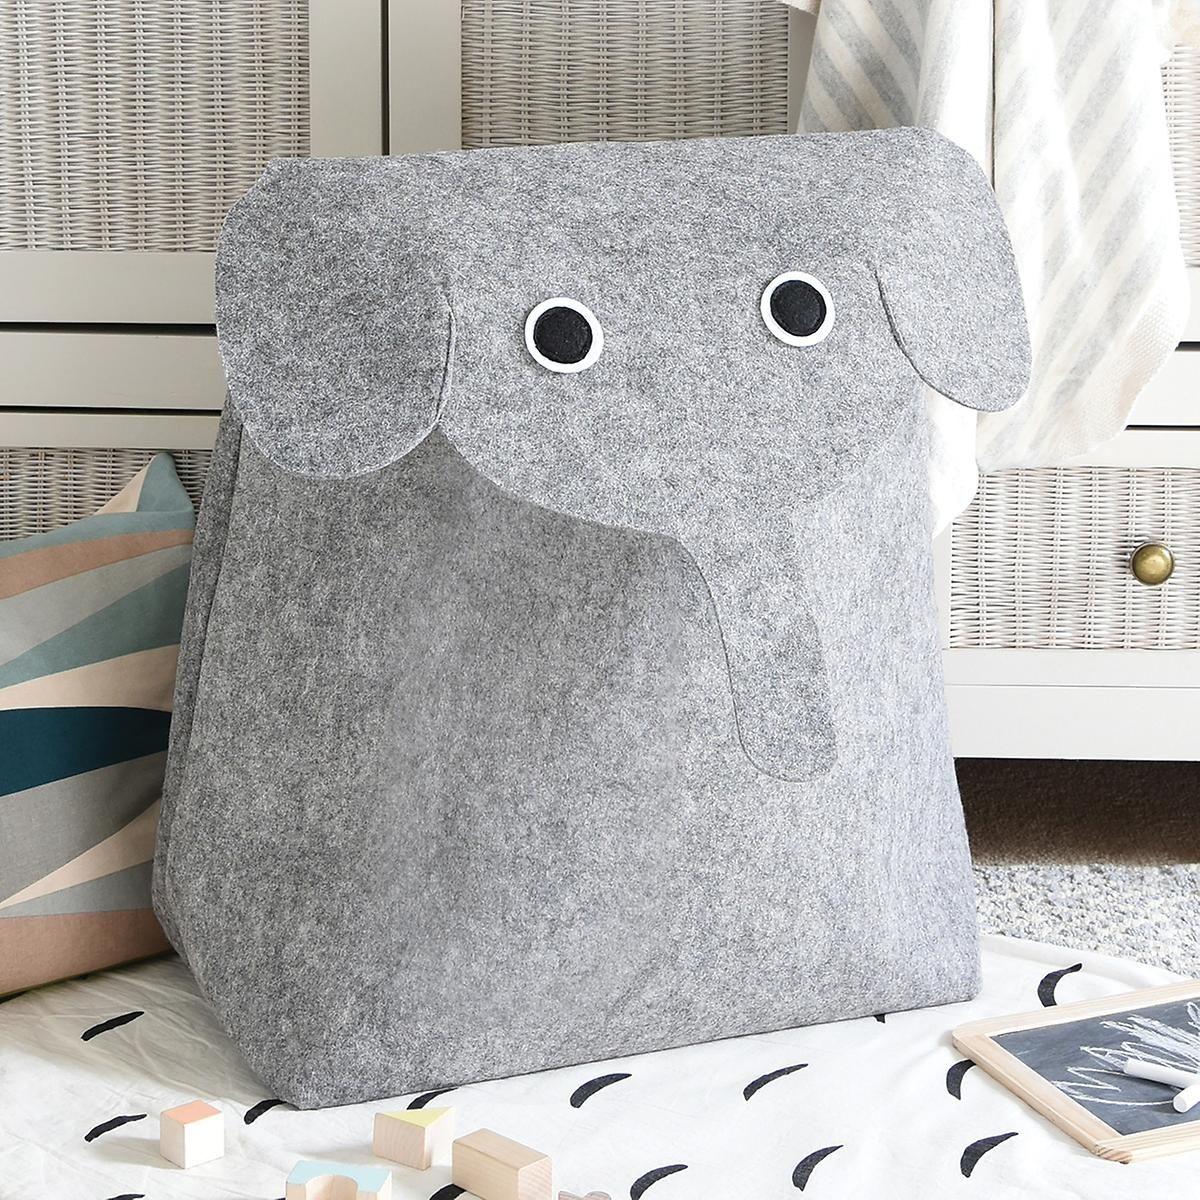 Little Stackers Elephant Hamper Elephant Hamper Laundry Hamper